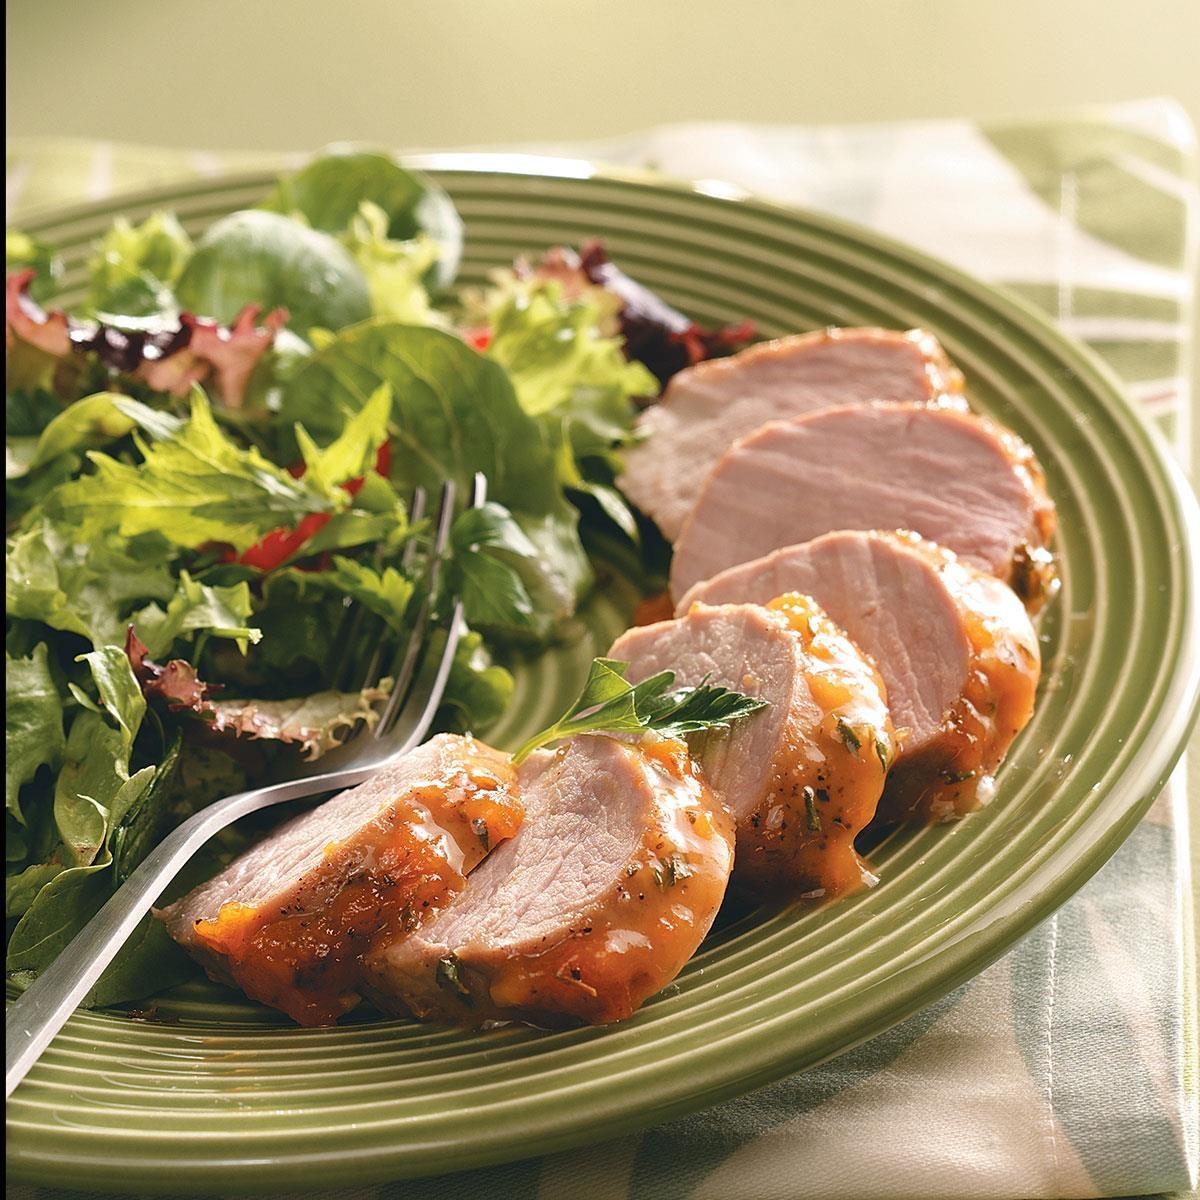 Pork loin apricot sauce recipe